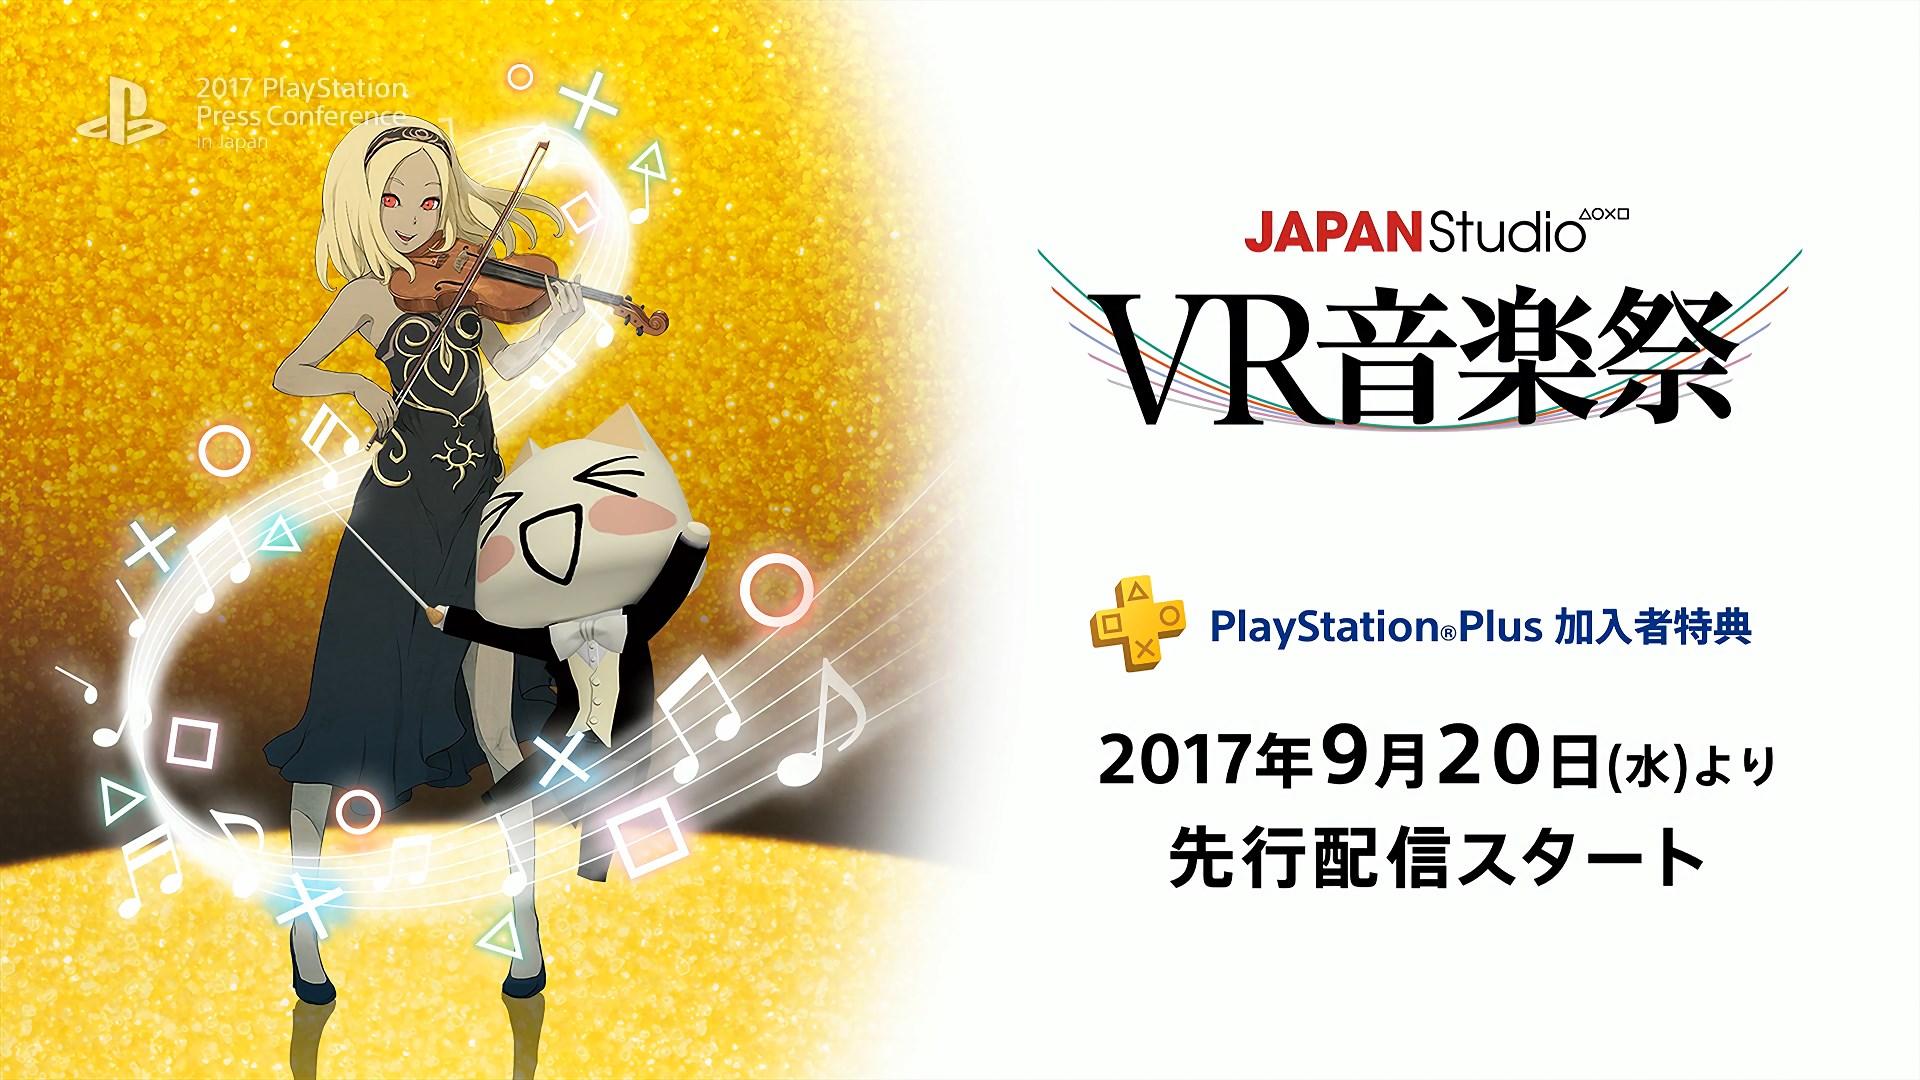 Japan Studio VR Music Festival Announced at TGS 2017